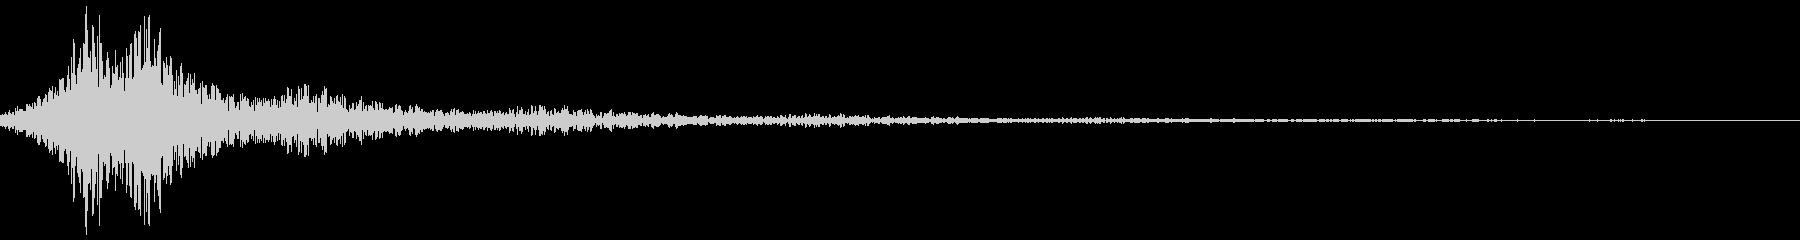 Tune (Metal passing sound)'s unreproduced waveform